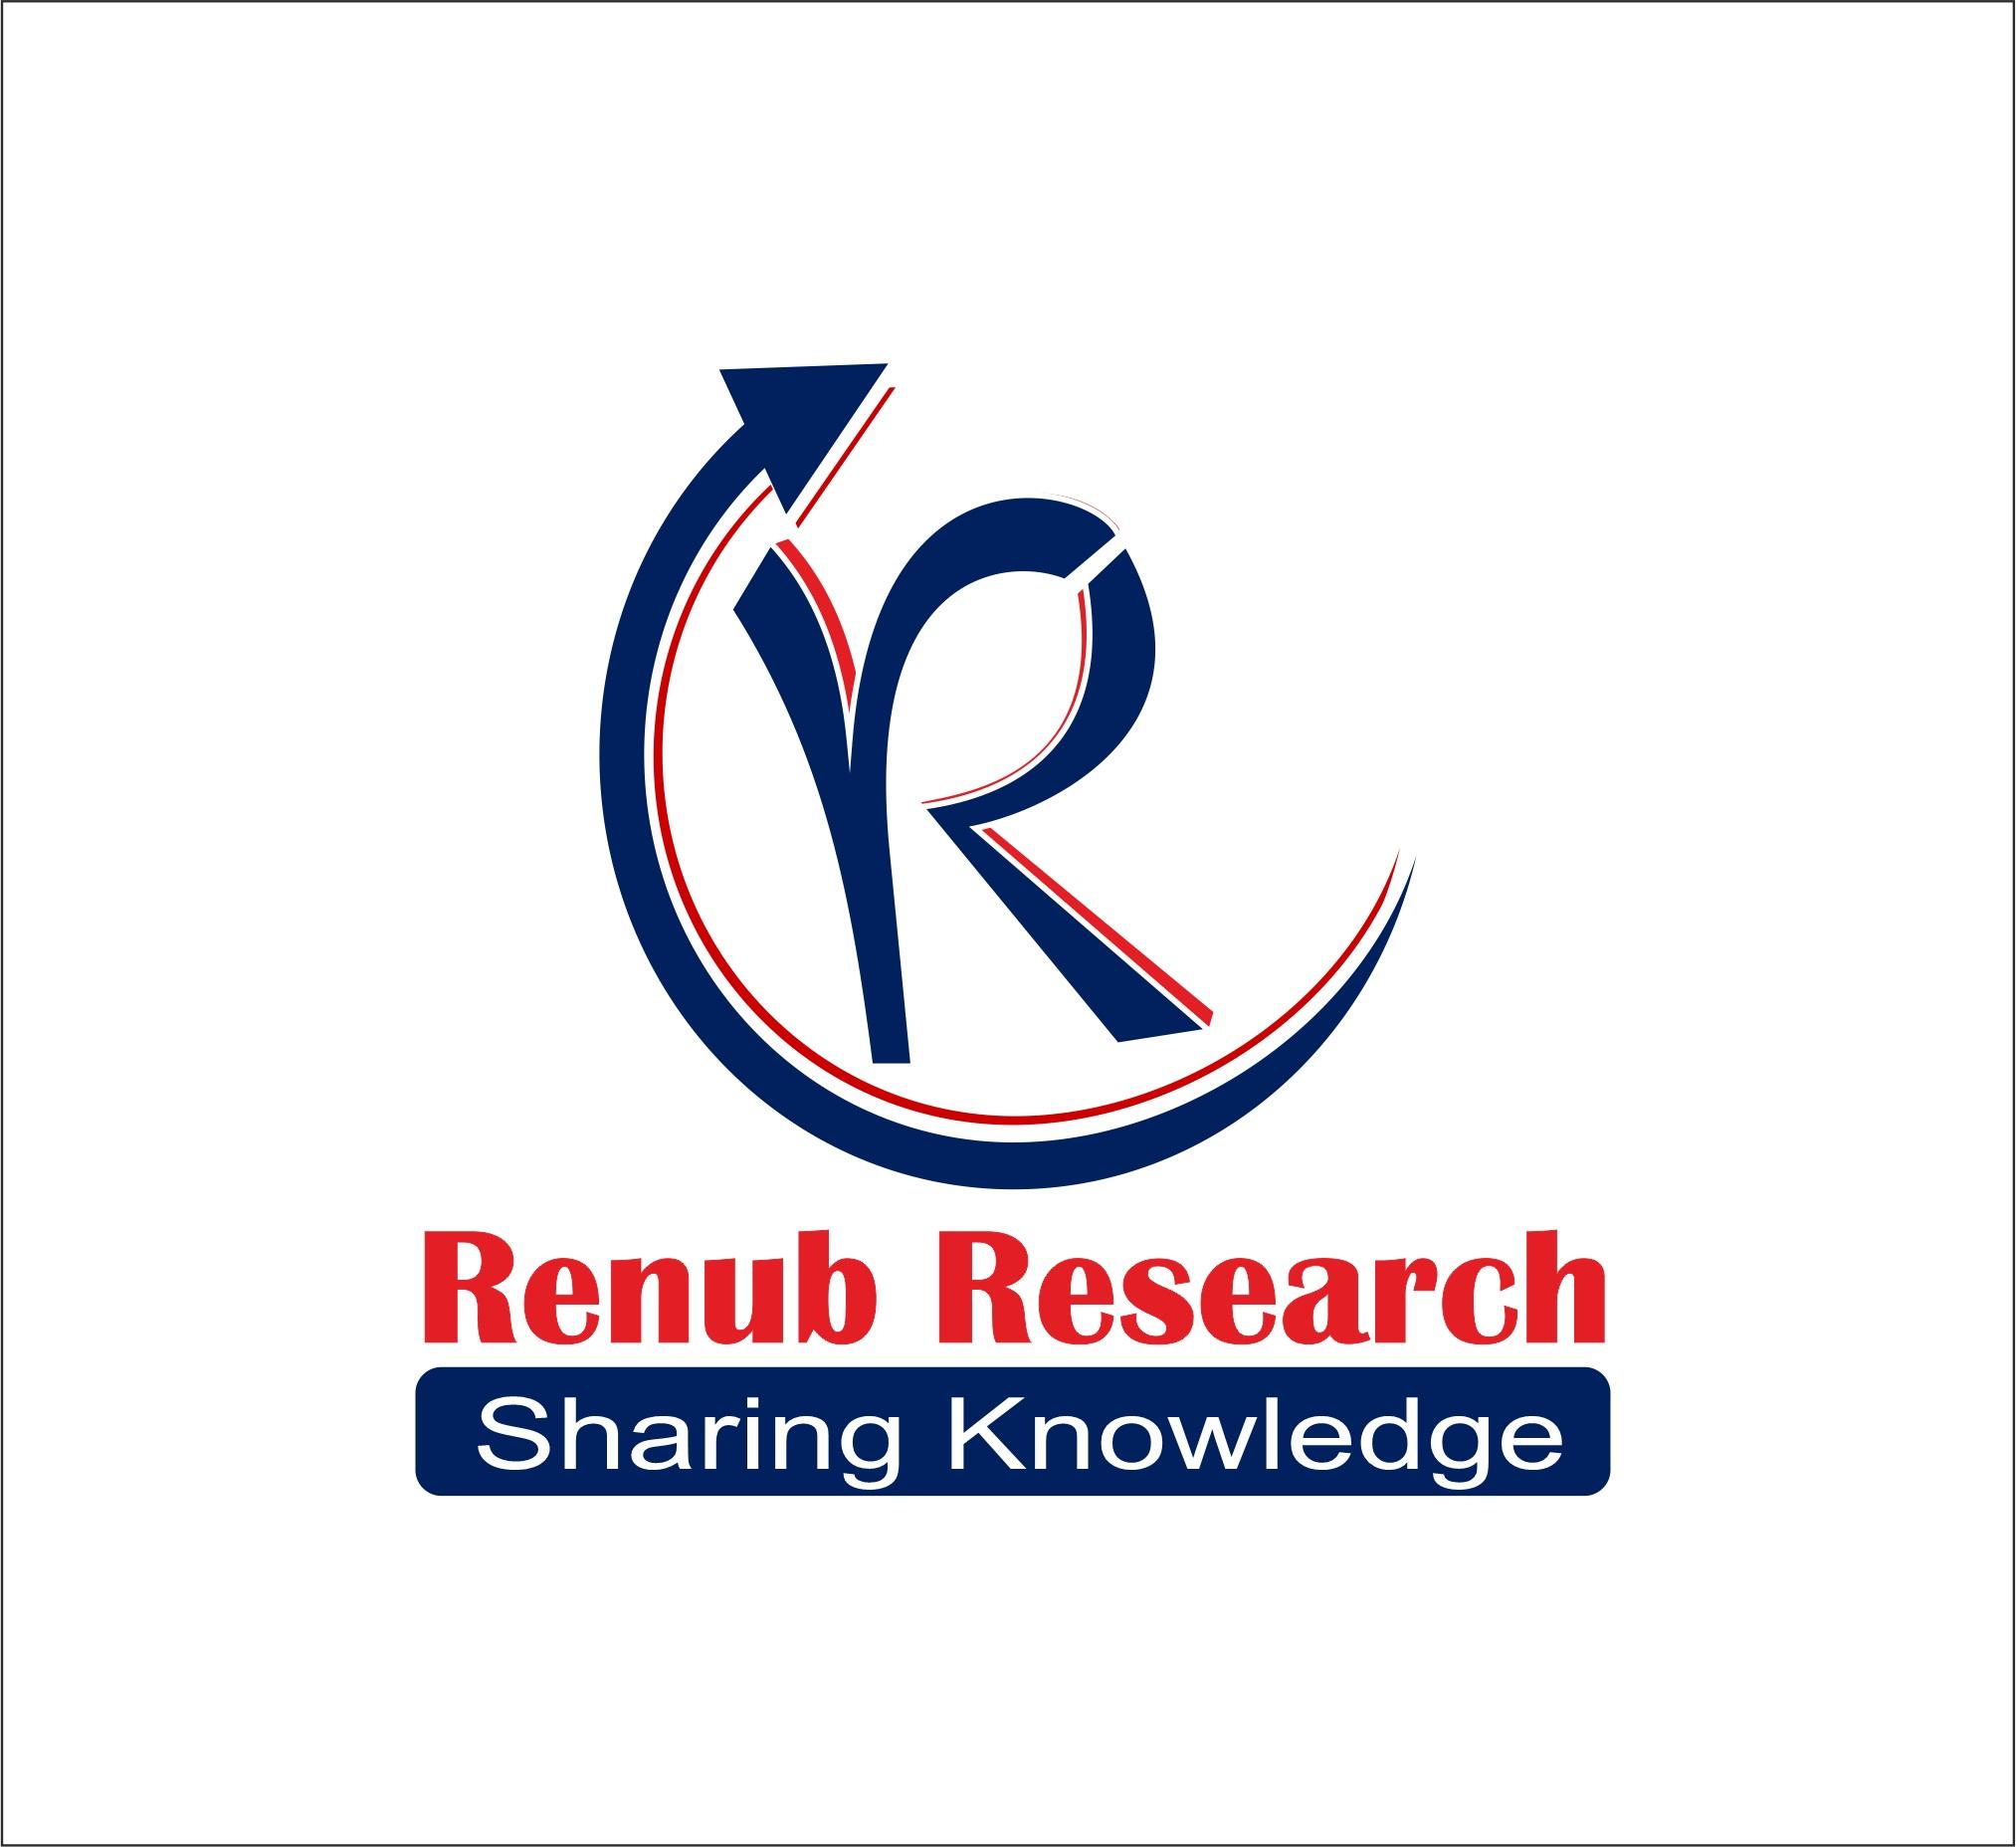 Europe Vending Machine Market will be US$ 25 Billion by 2025 - Renub Research